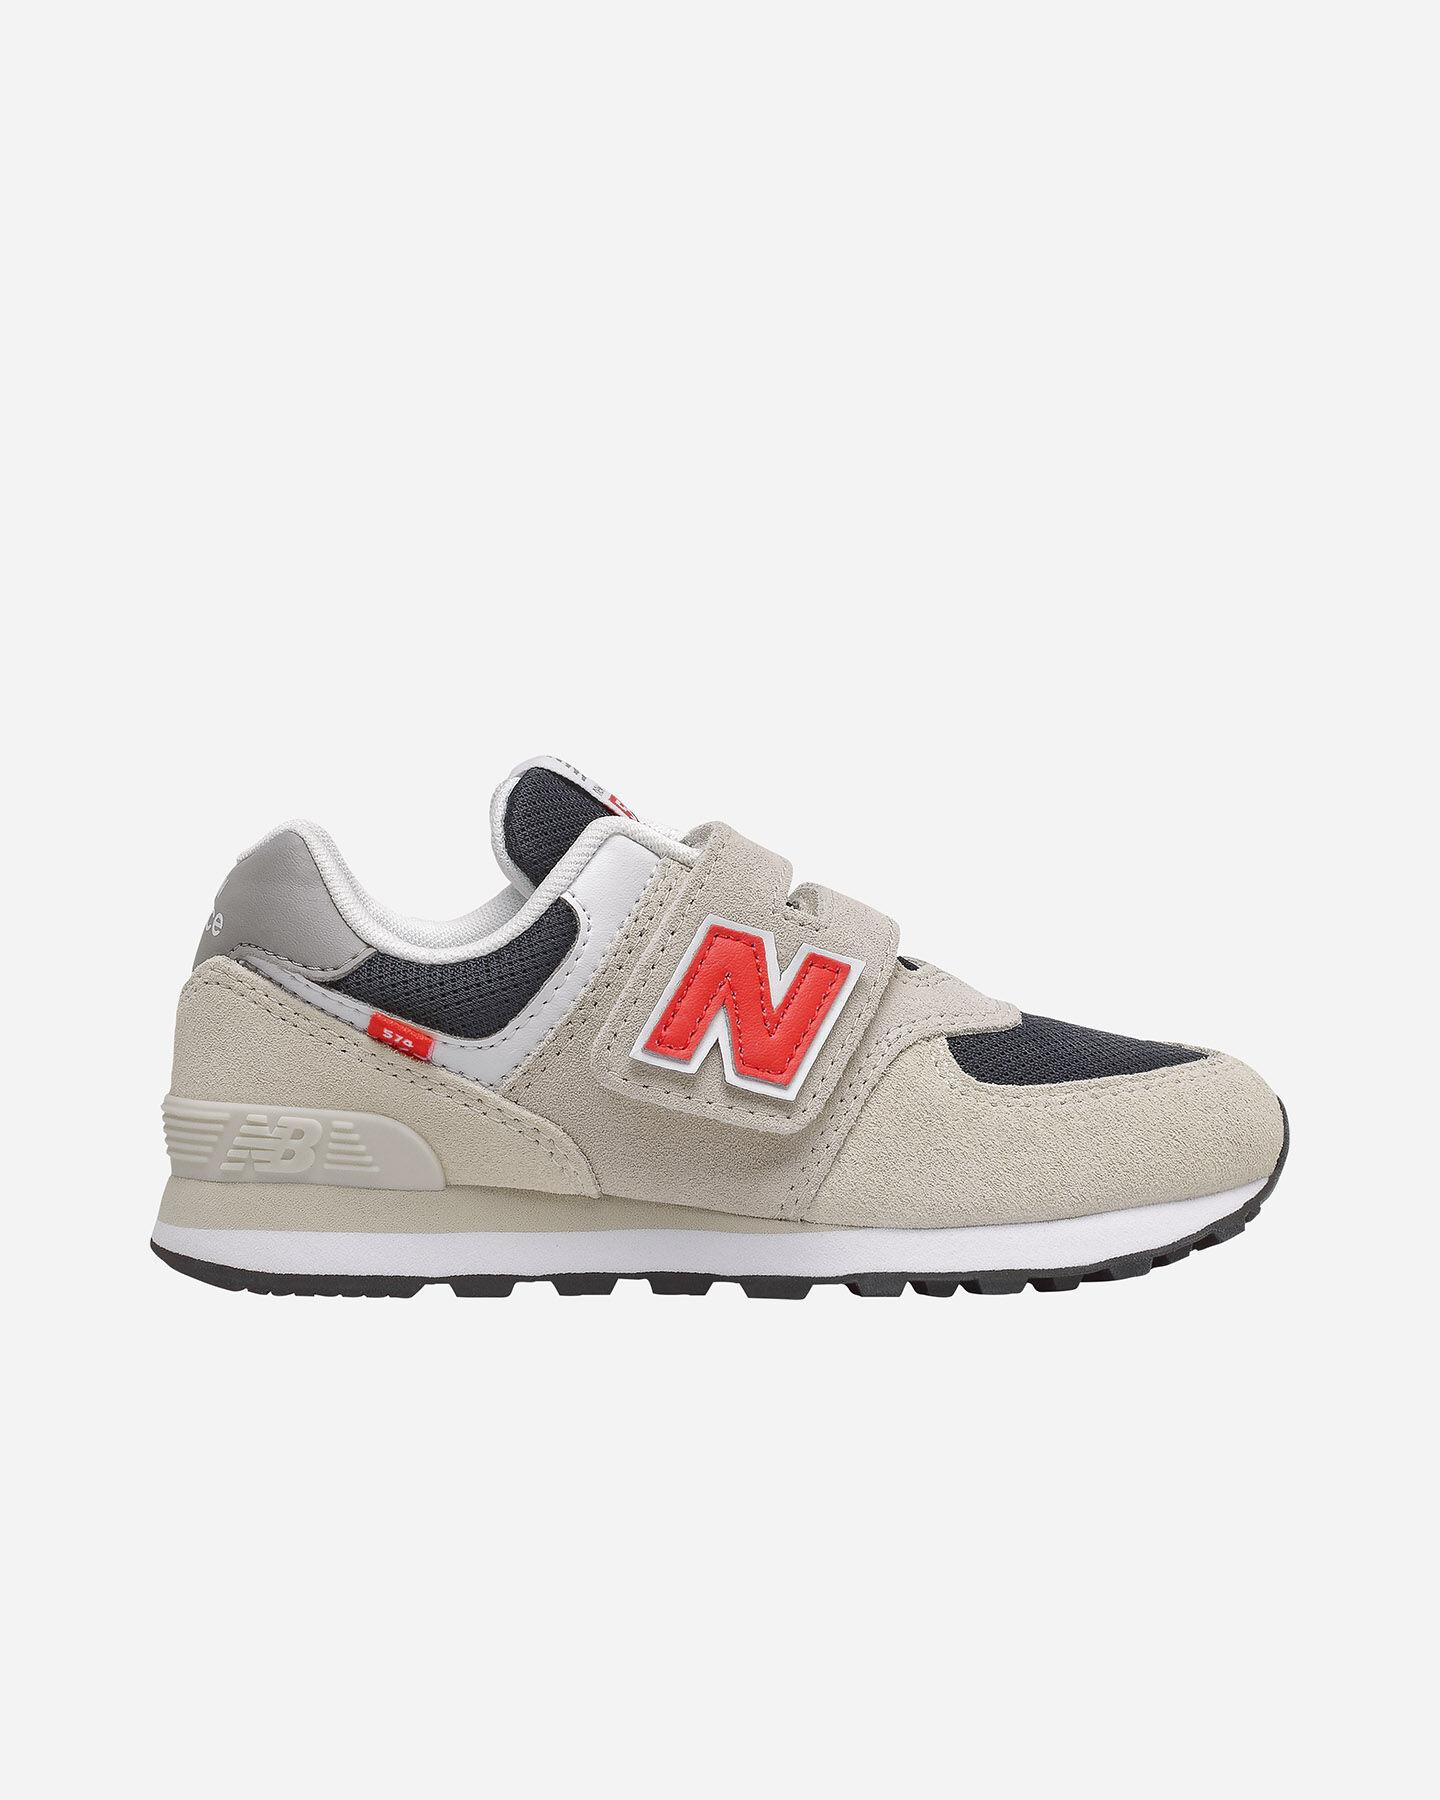 New Balance Bambino: sneakers e scarpe da running | Cisalfa Sport